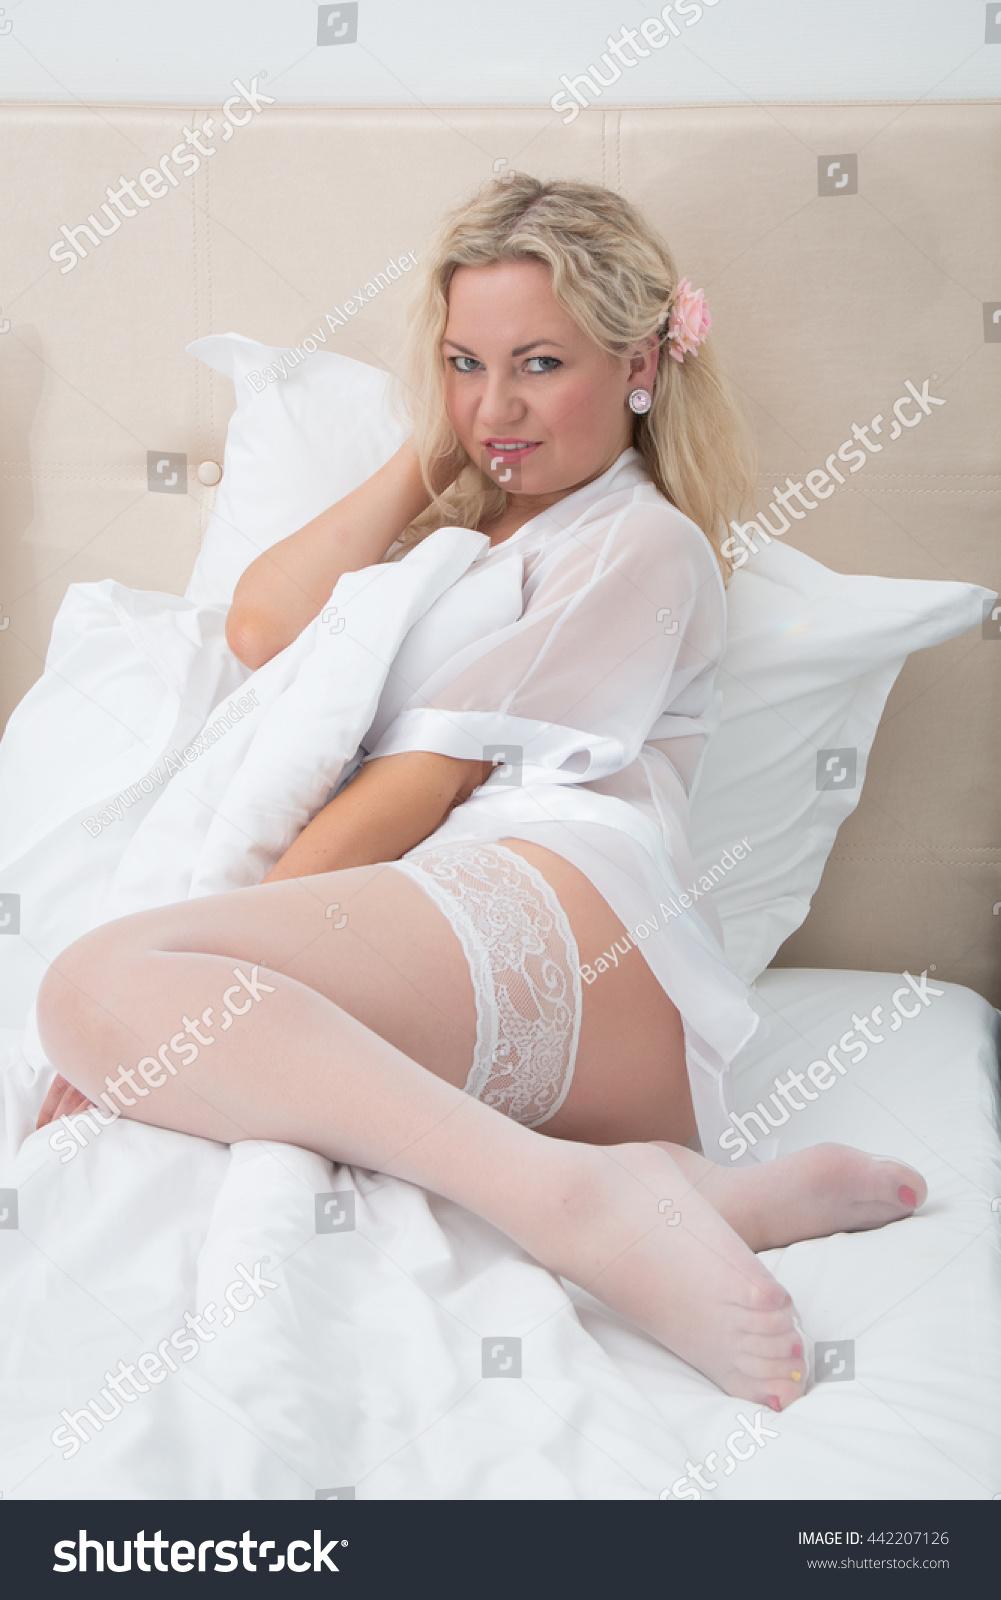 Sexy Woman White Lingerie Stockings Portrait Stock Photo Edit Now 442207126